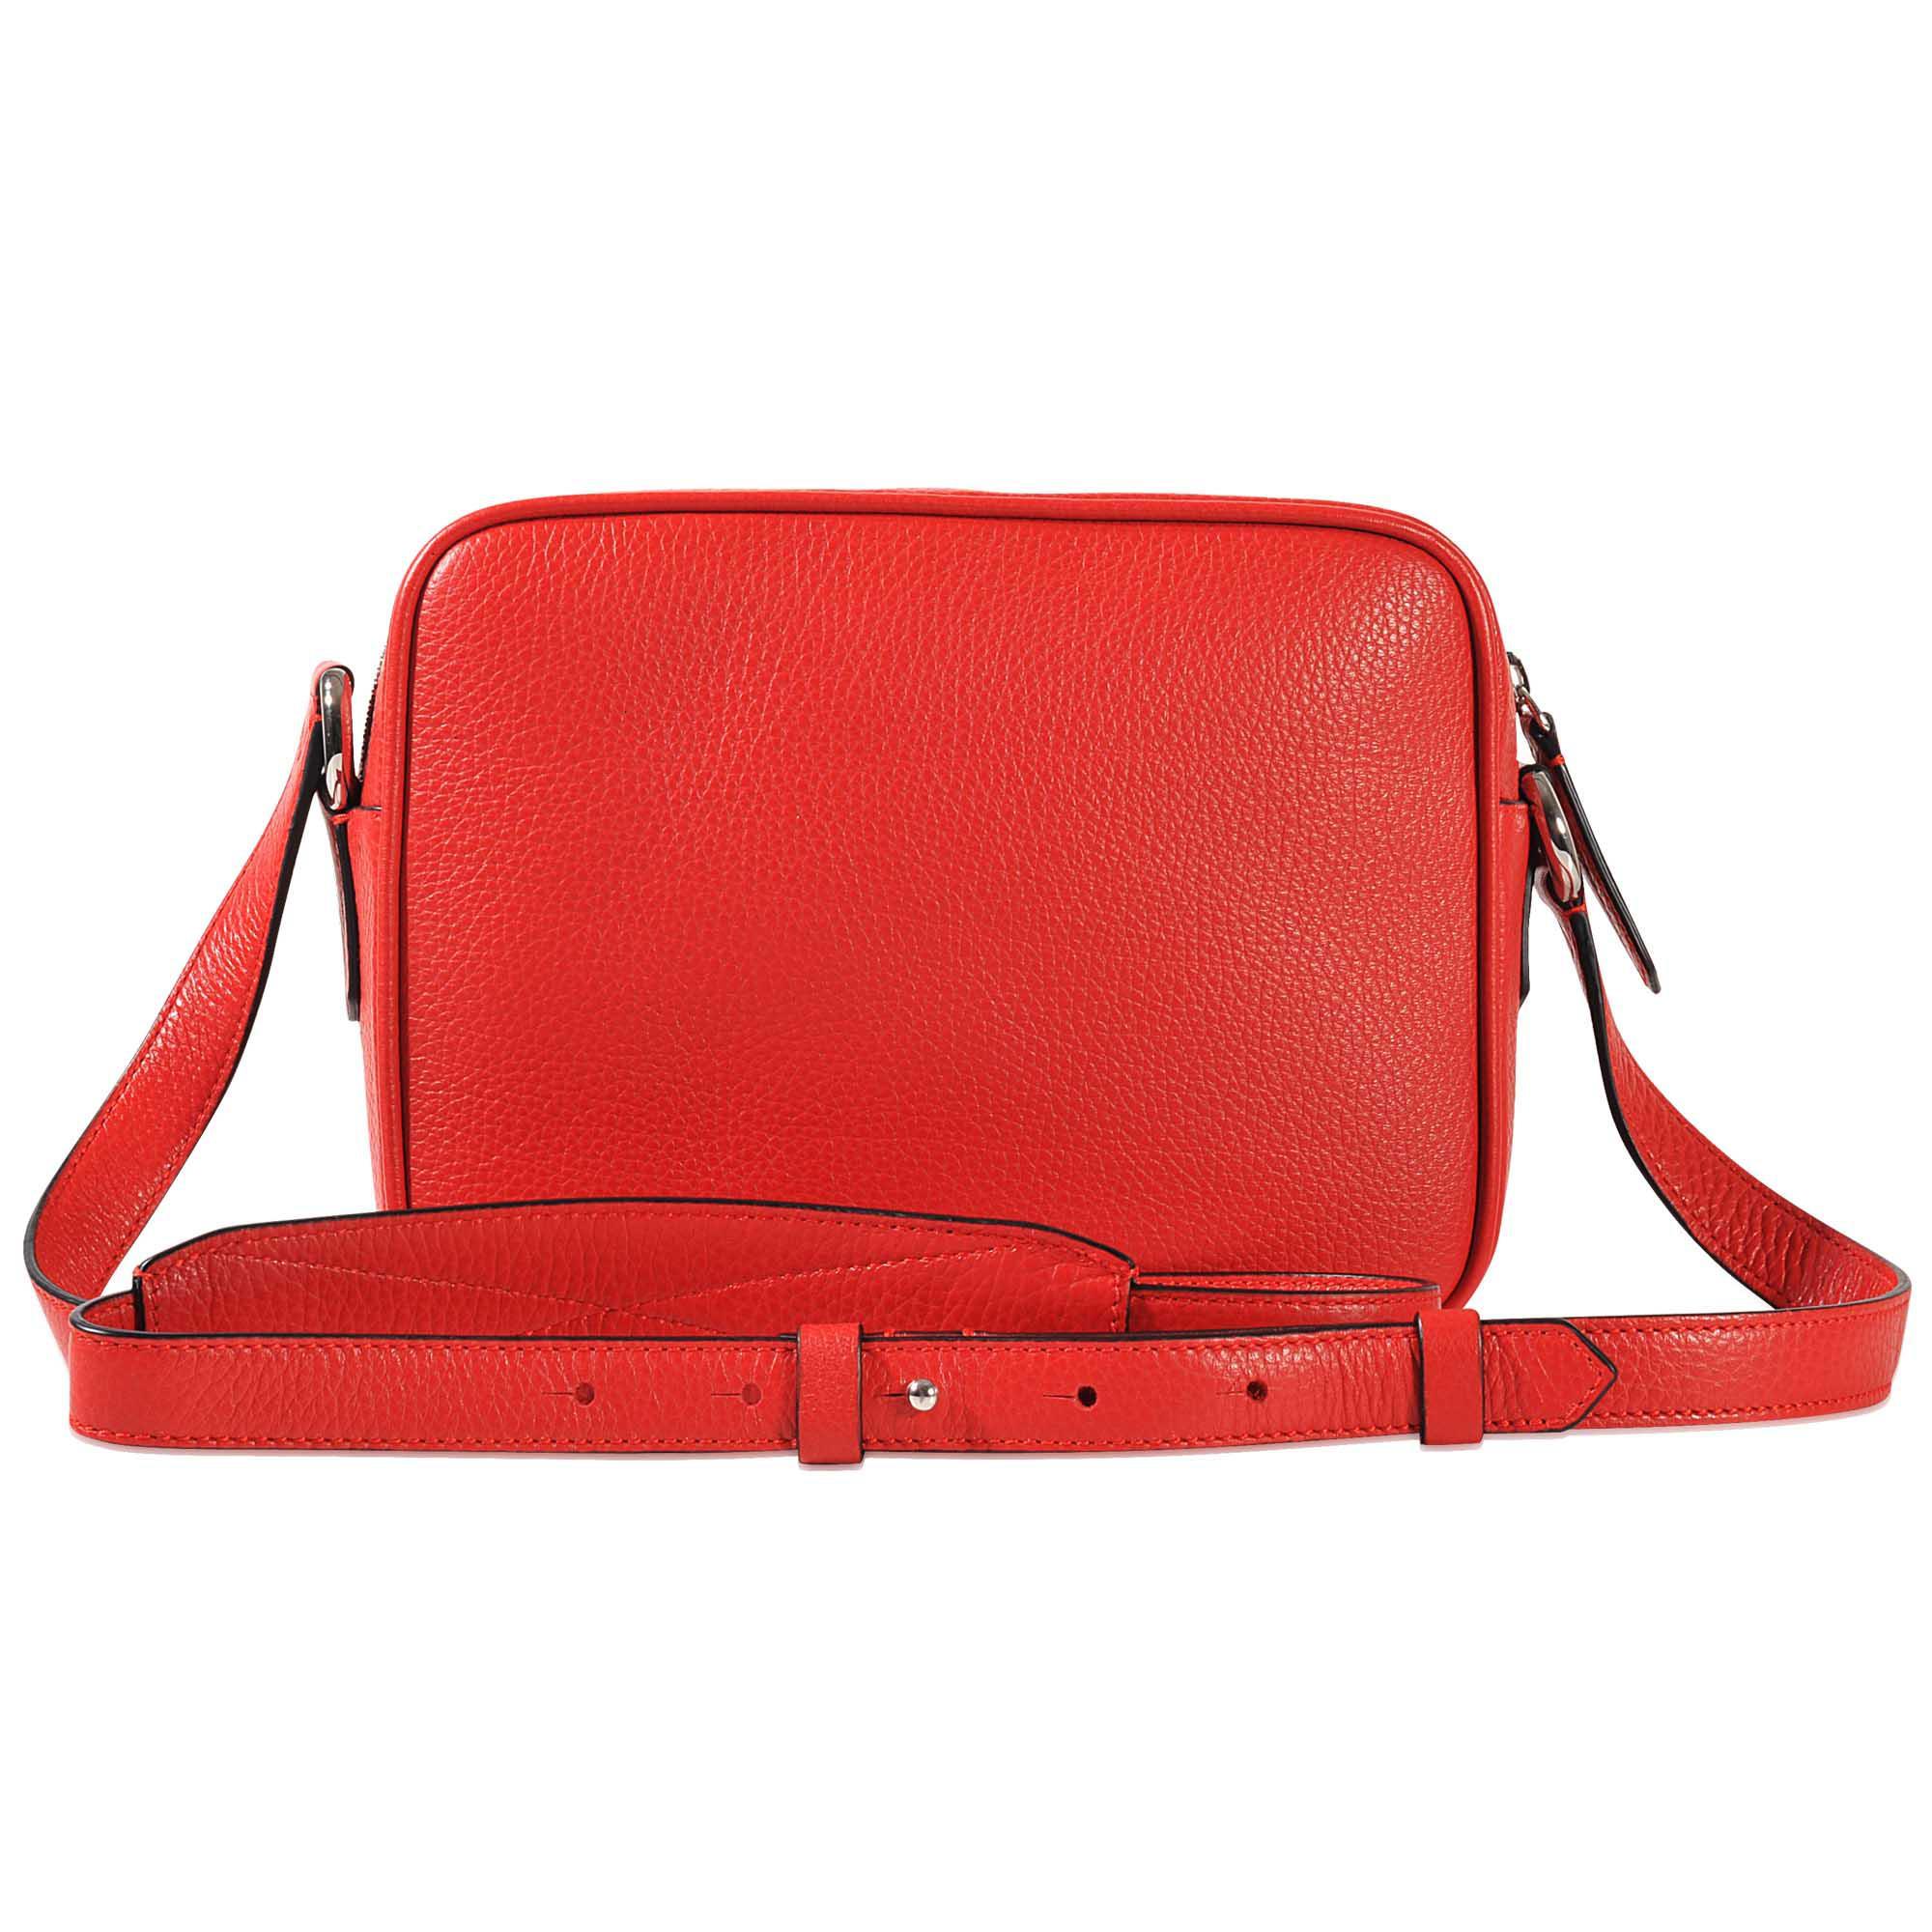 Lancel Nine Crossbody Bag in Red